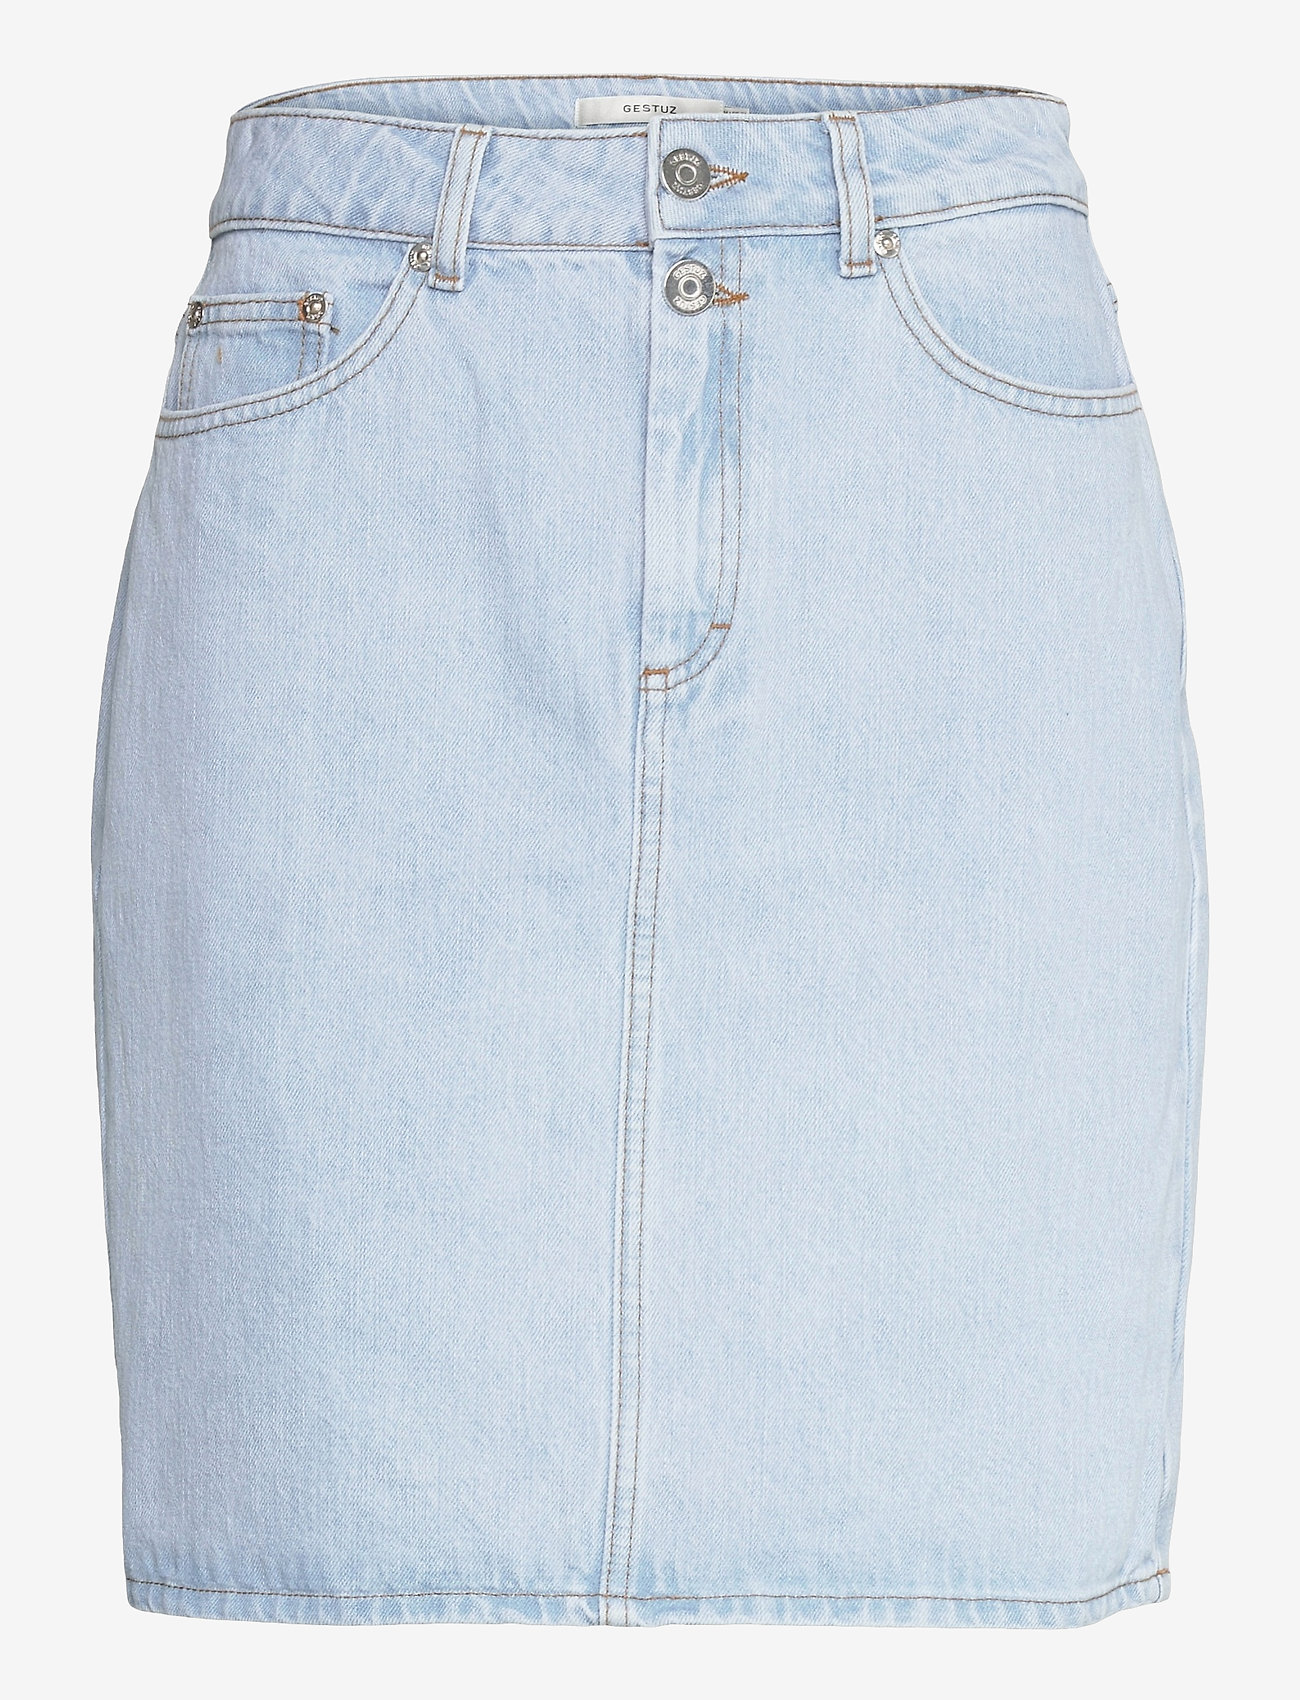 Gestuz - DacyGZ HW skirt - jeanskjolar - light blue vintage - 1